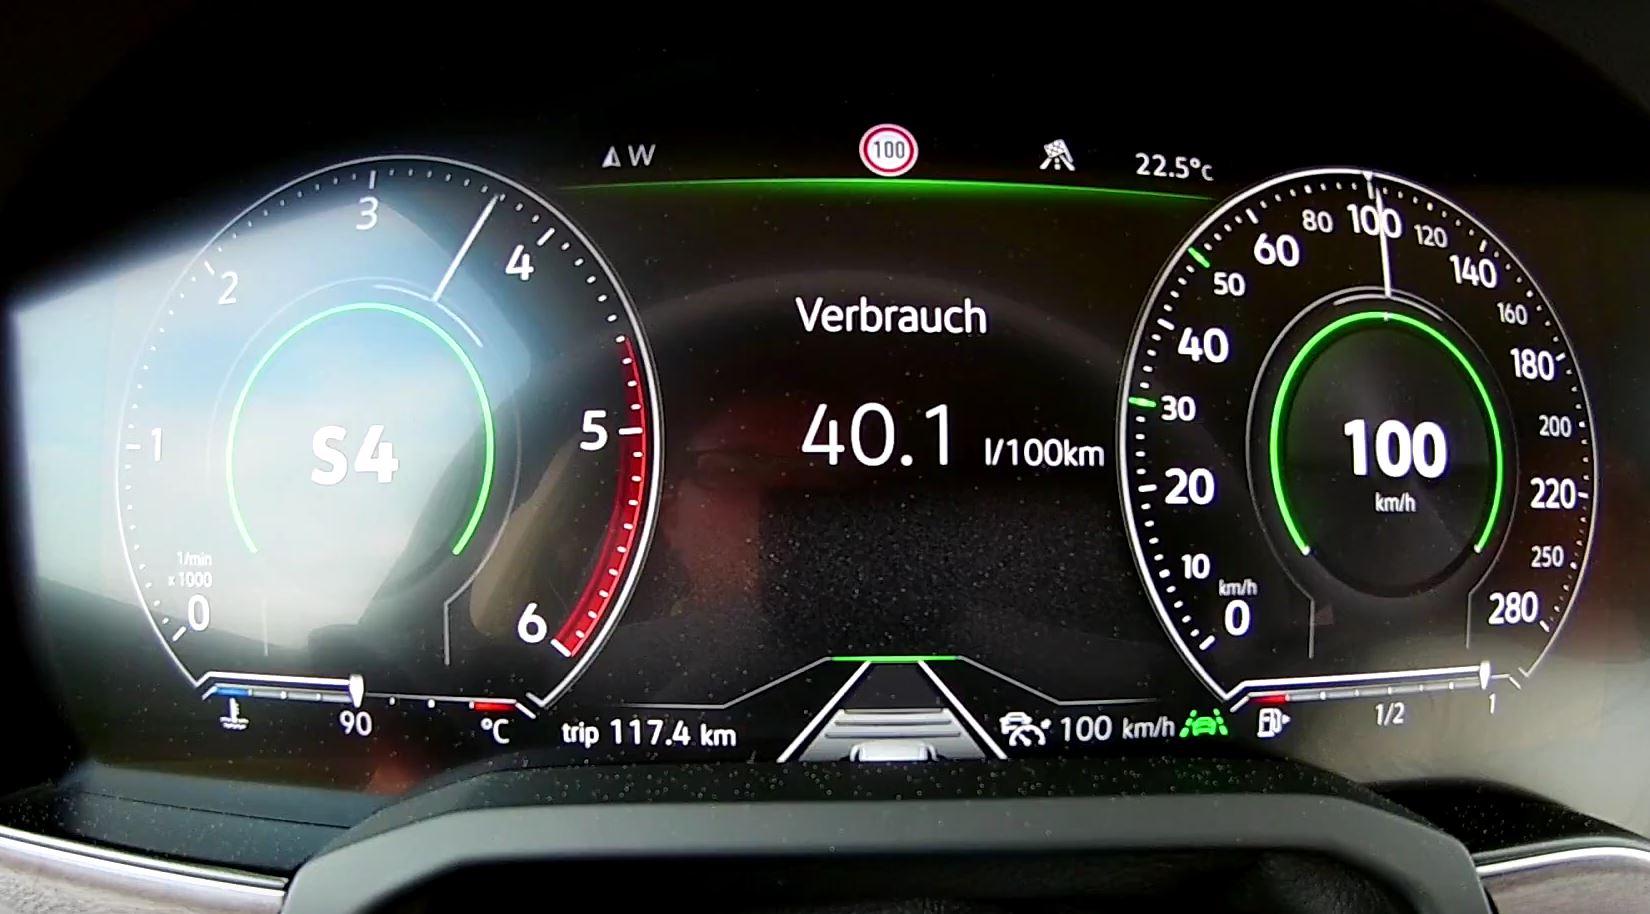 2019 Vw Touareg 30 V6 Tdi 286 Hp Does The 0 To 100 Kmh Sprint